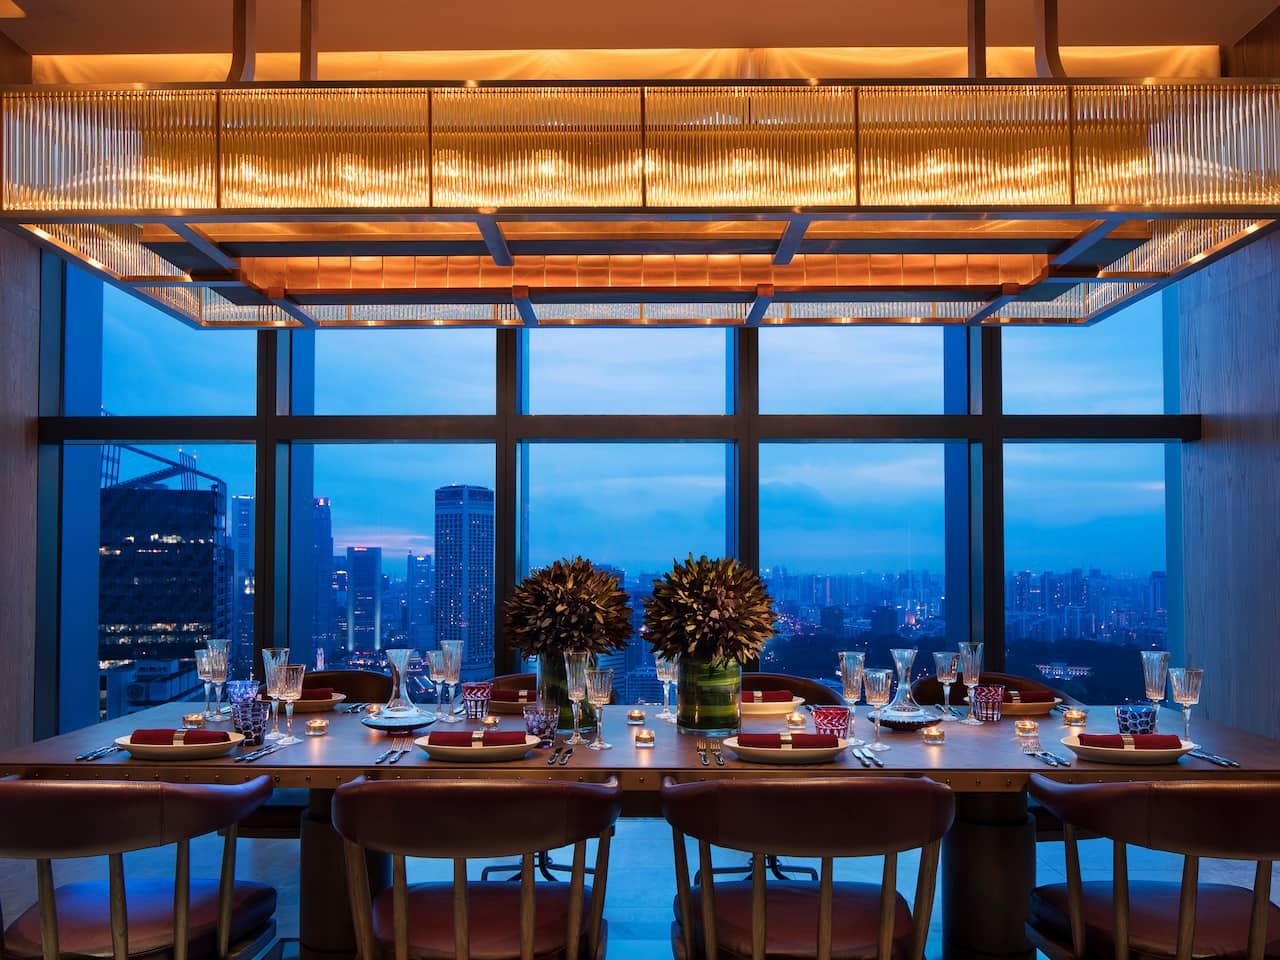 665 Farenheit Premium Steakhouse Restaurant Andaz Singapore